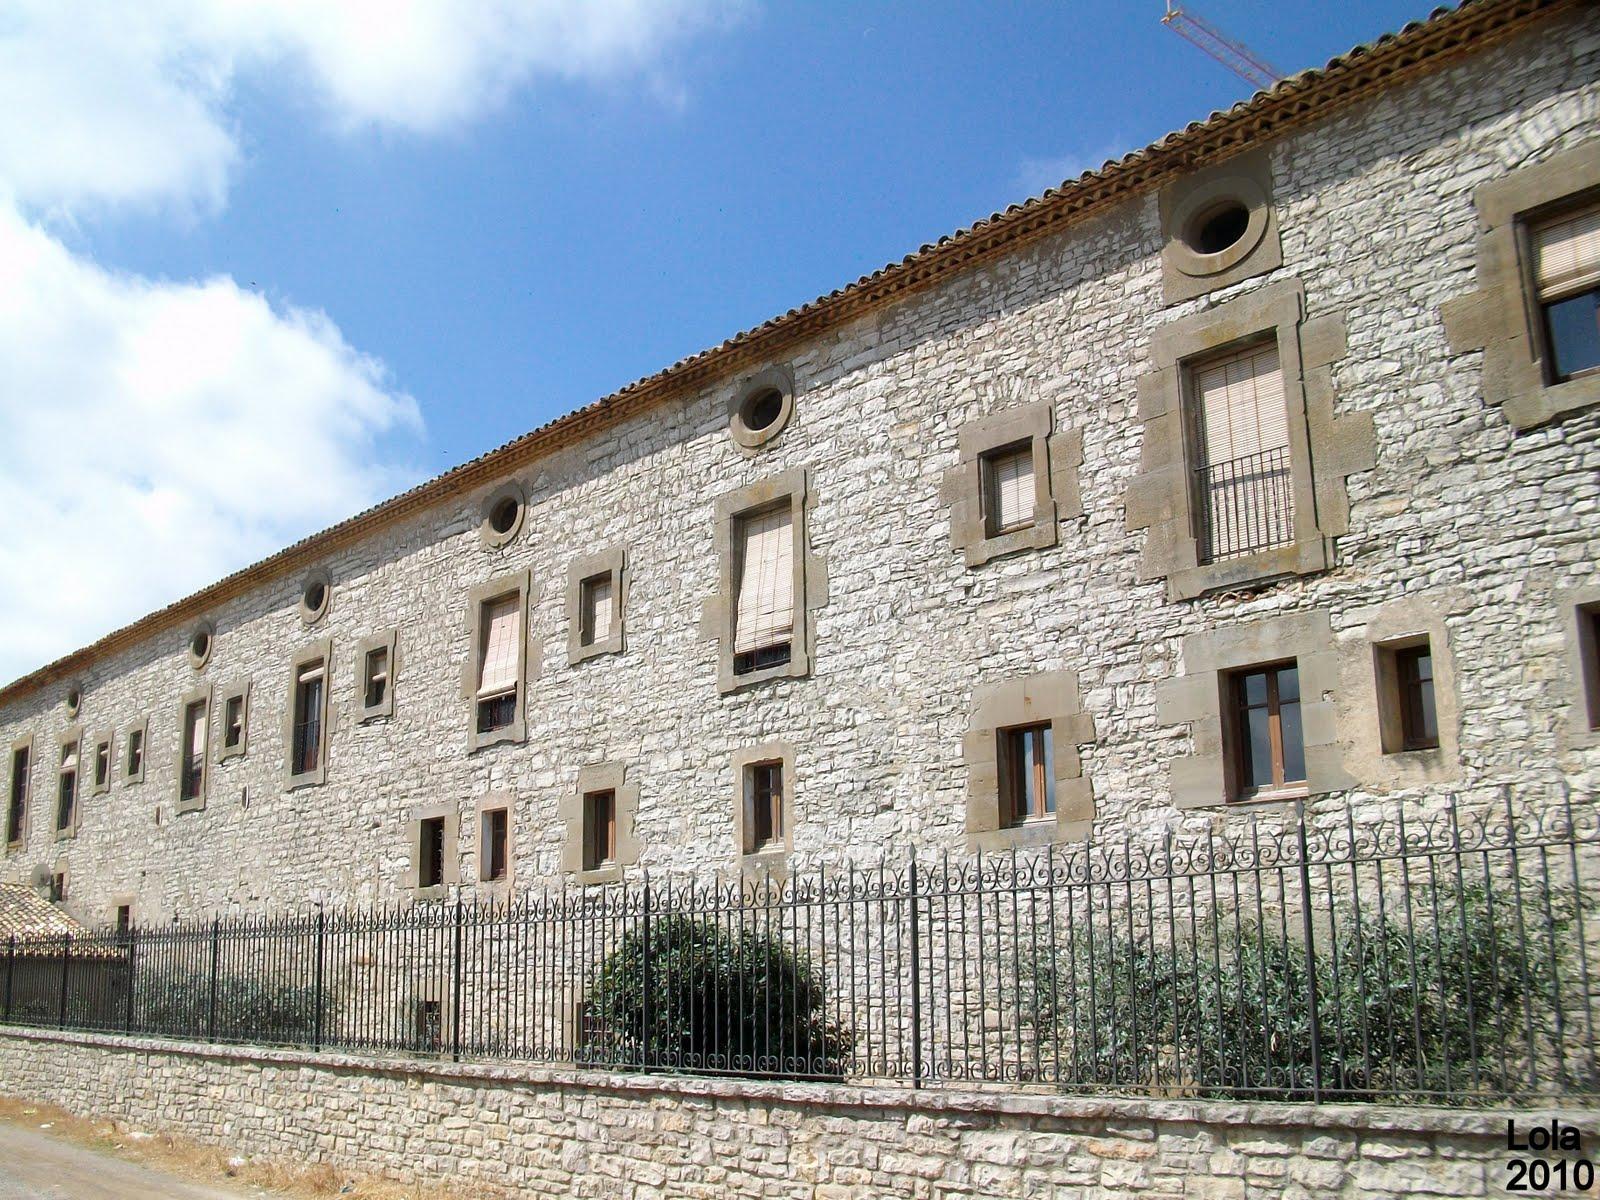 Monestir de Santuari de Sant Ramon Nonat